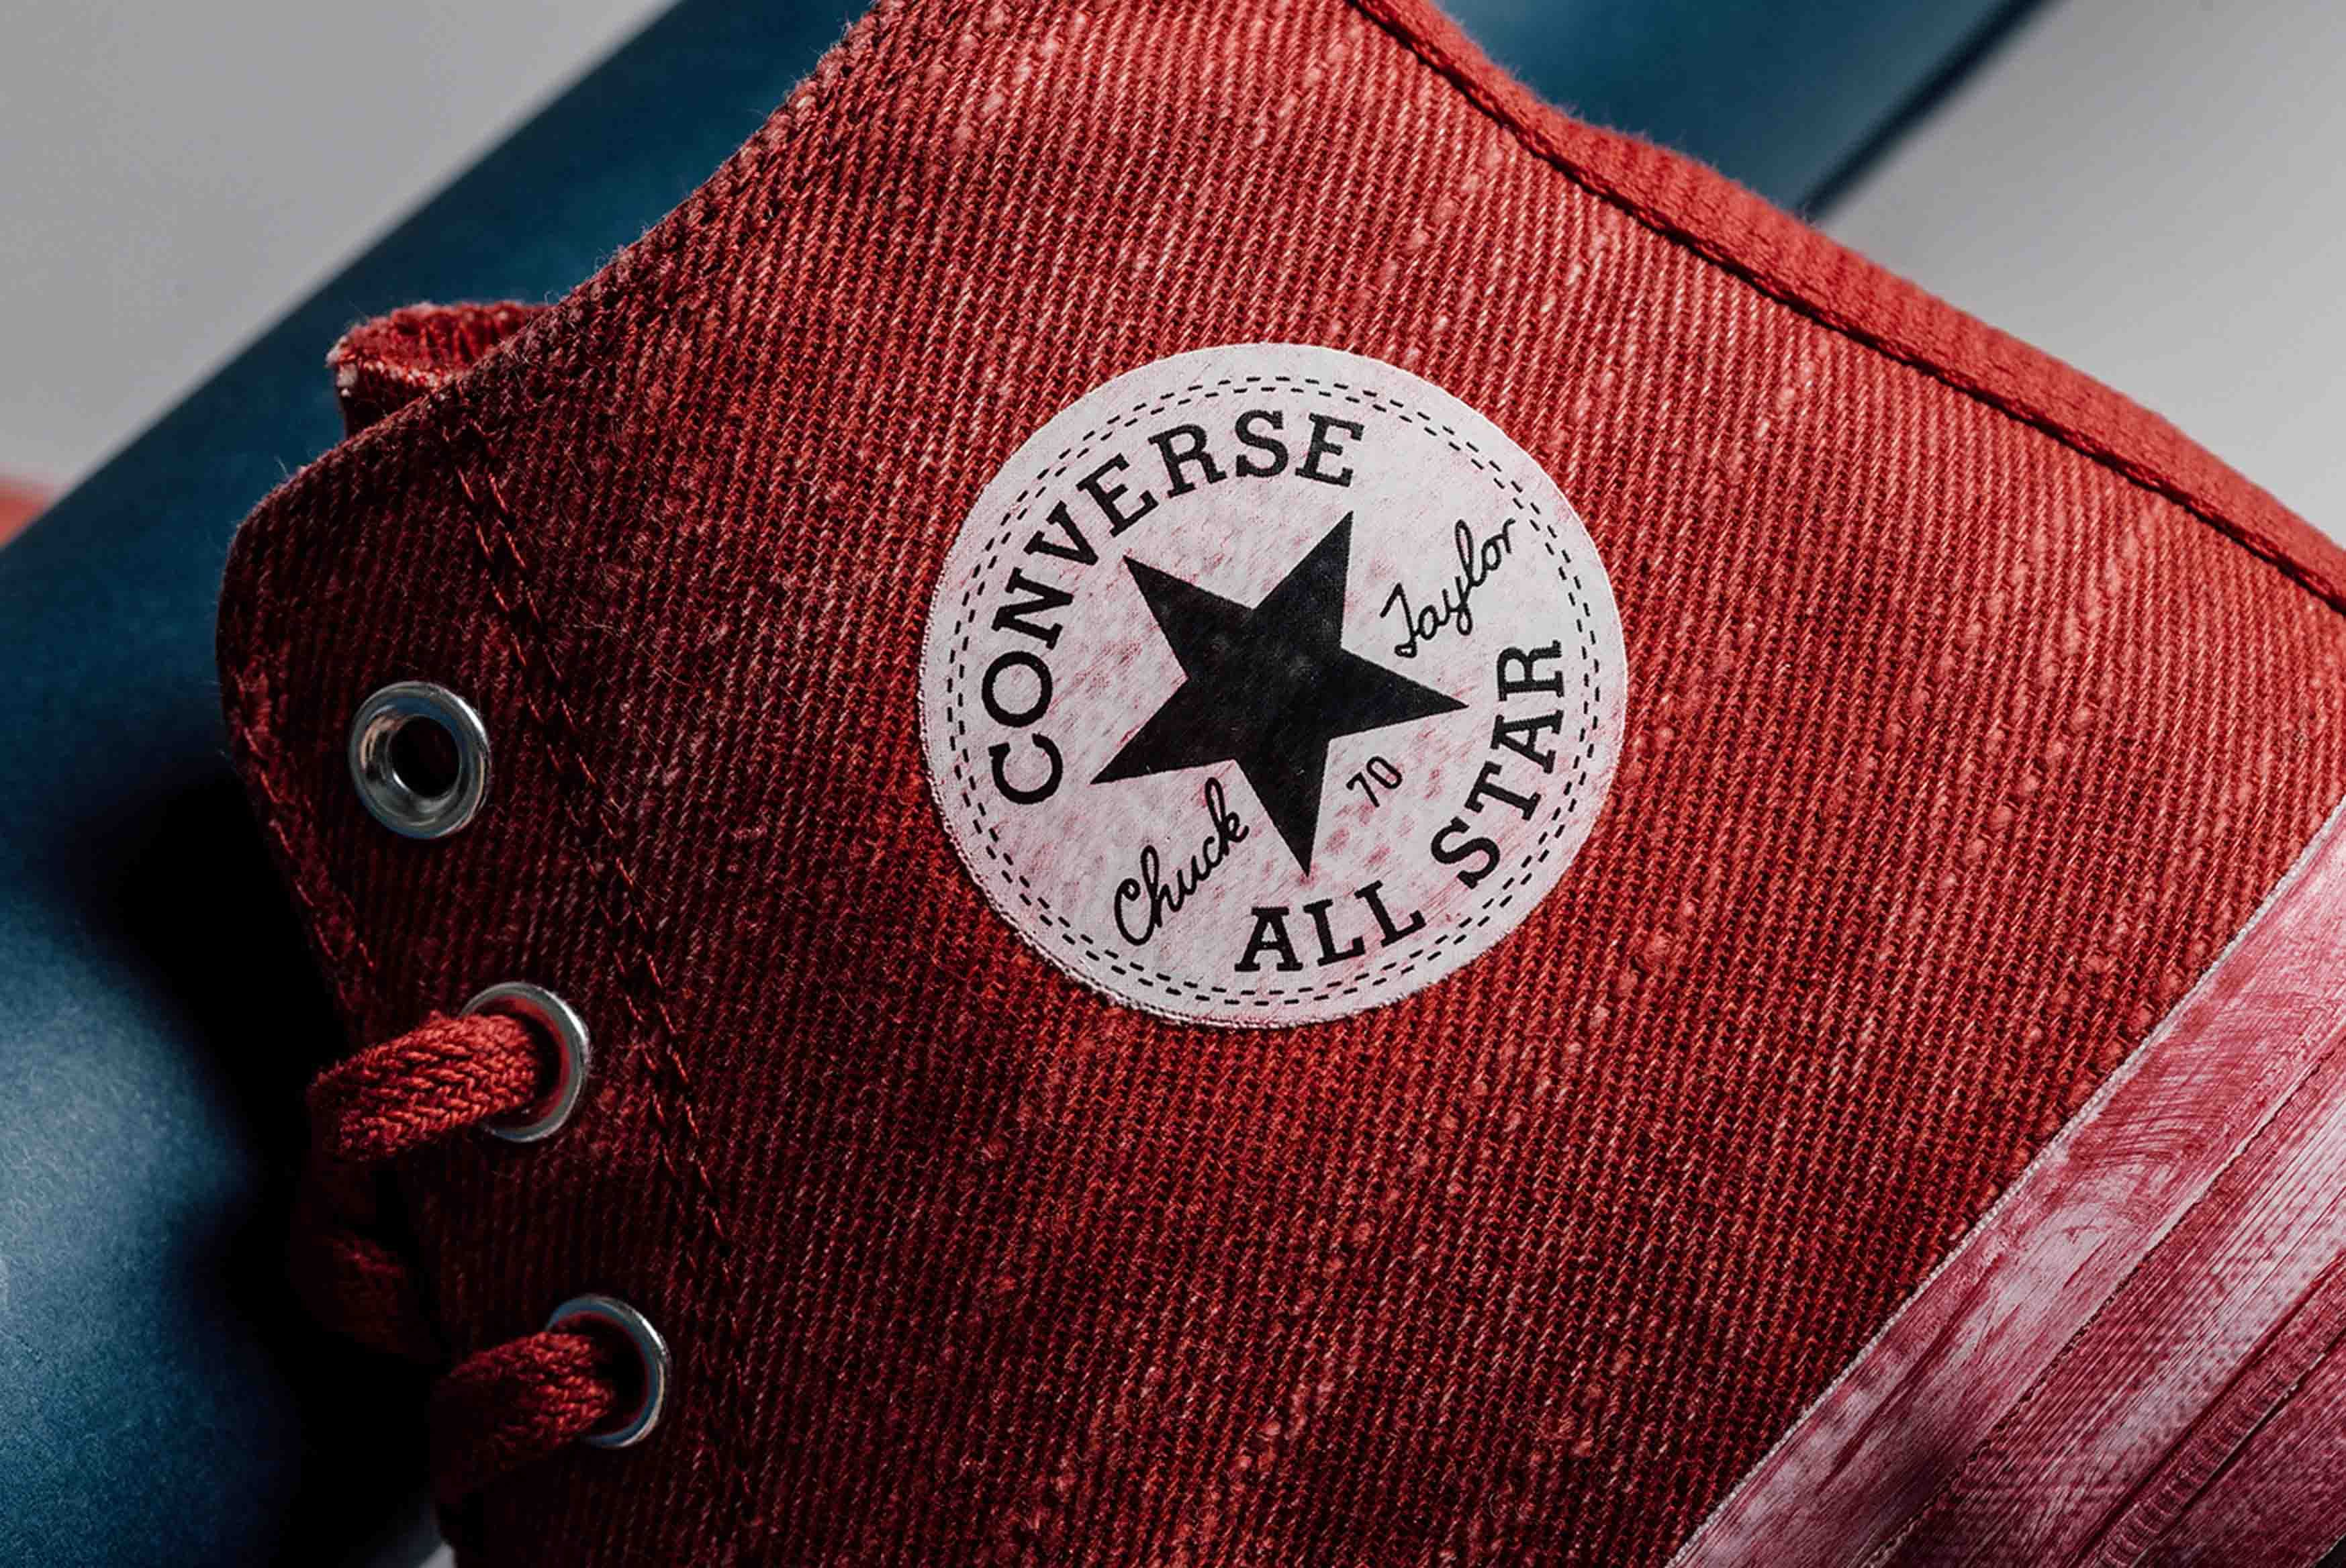 Converse Chuck 70 Hi Overdryed Wash Pack 006 Sneaker Freaker